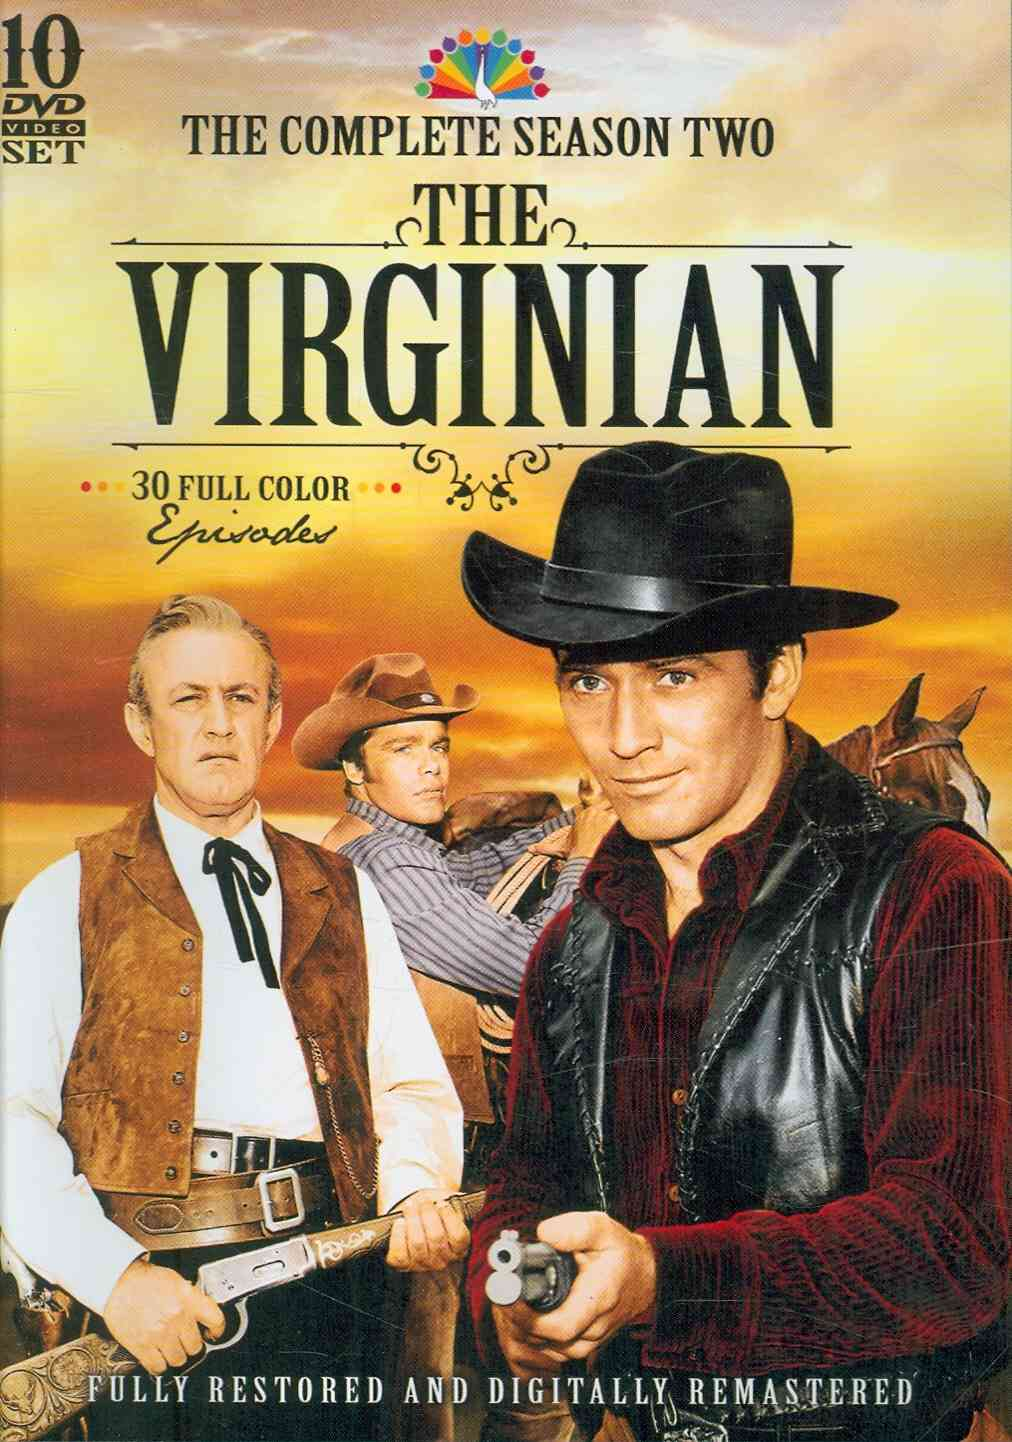 The Virginian: The Complete Season 2 (DVD)